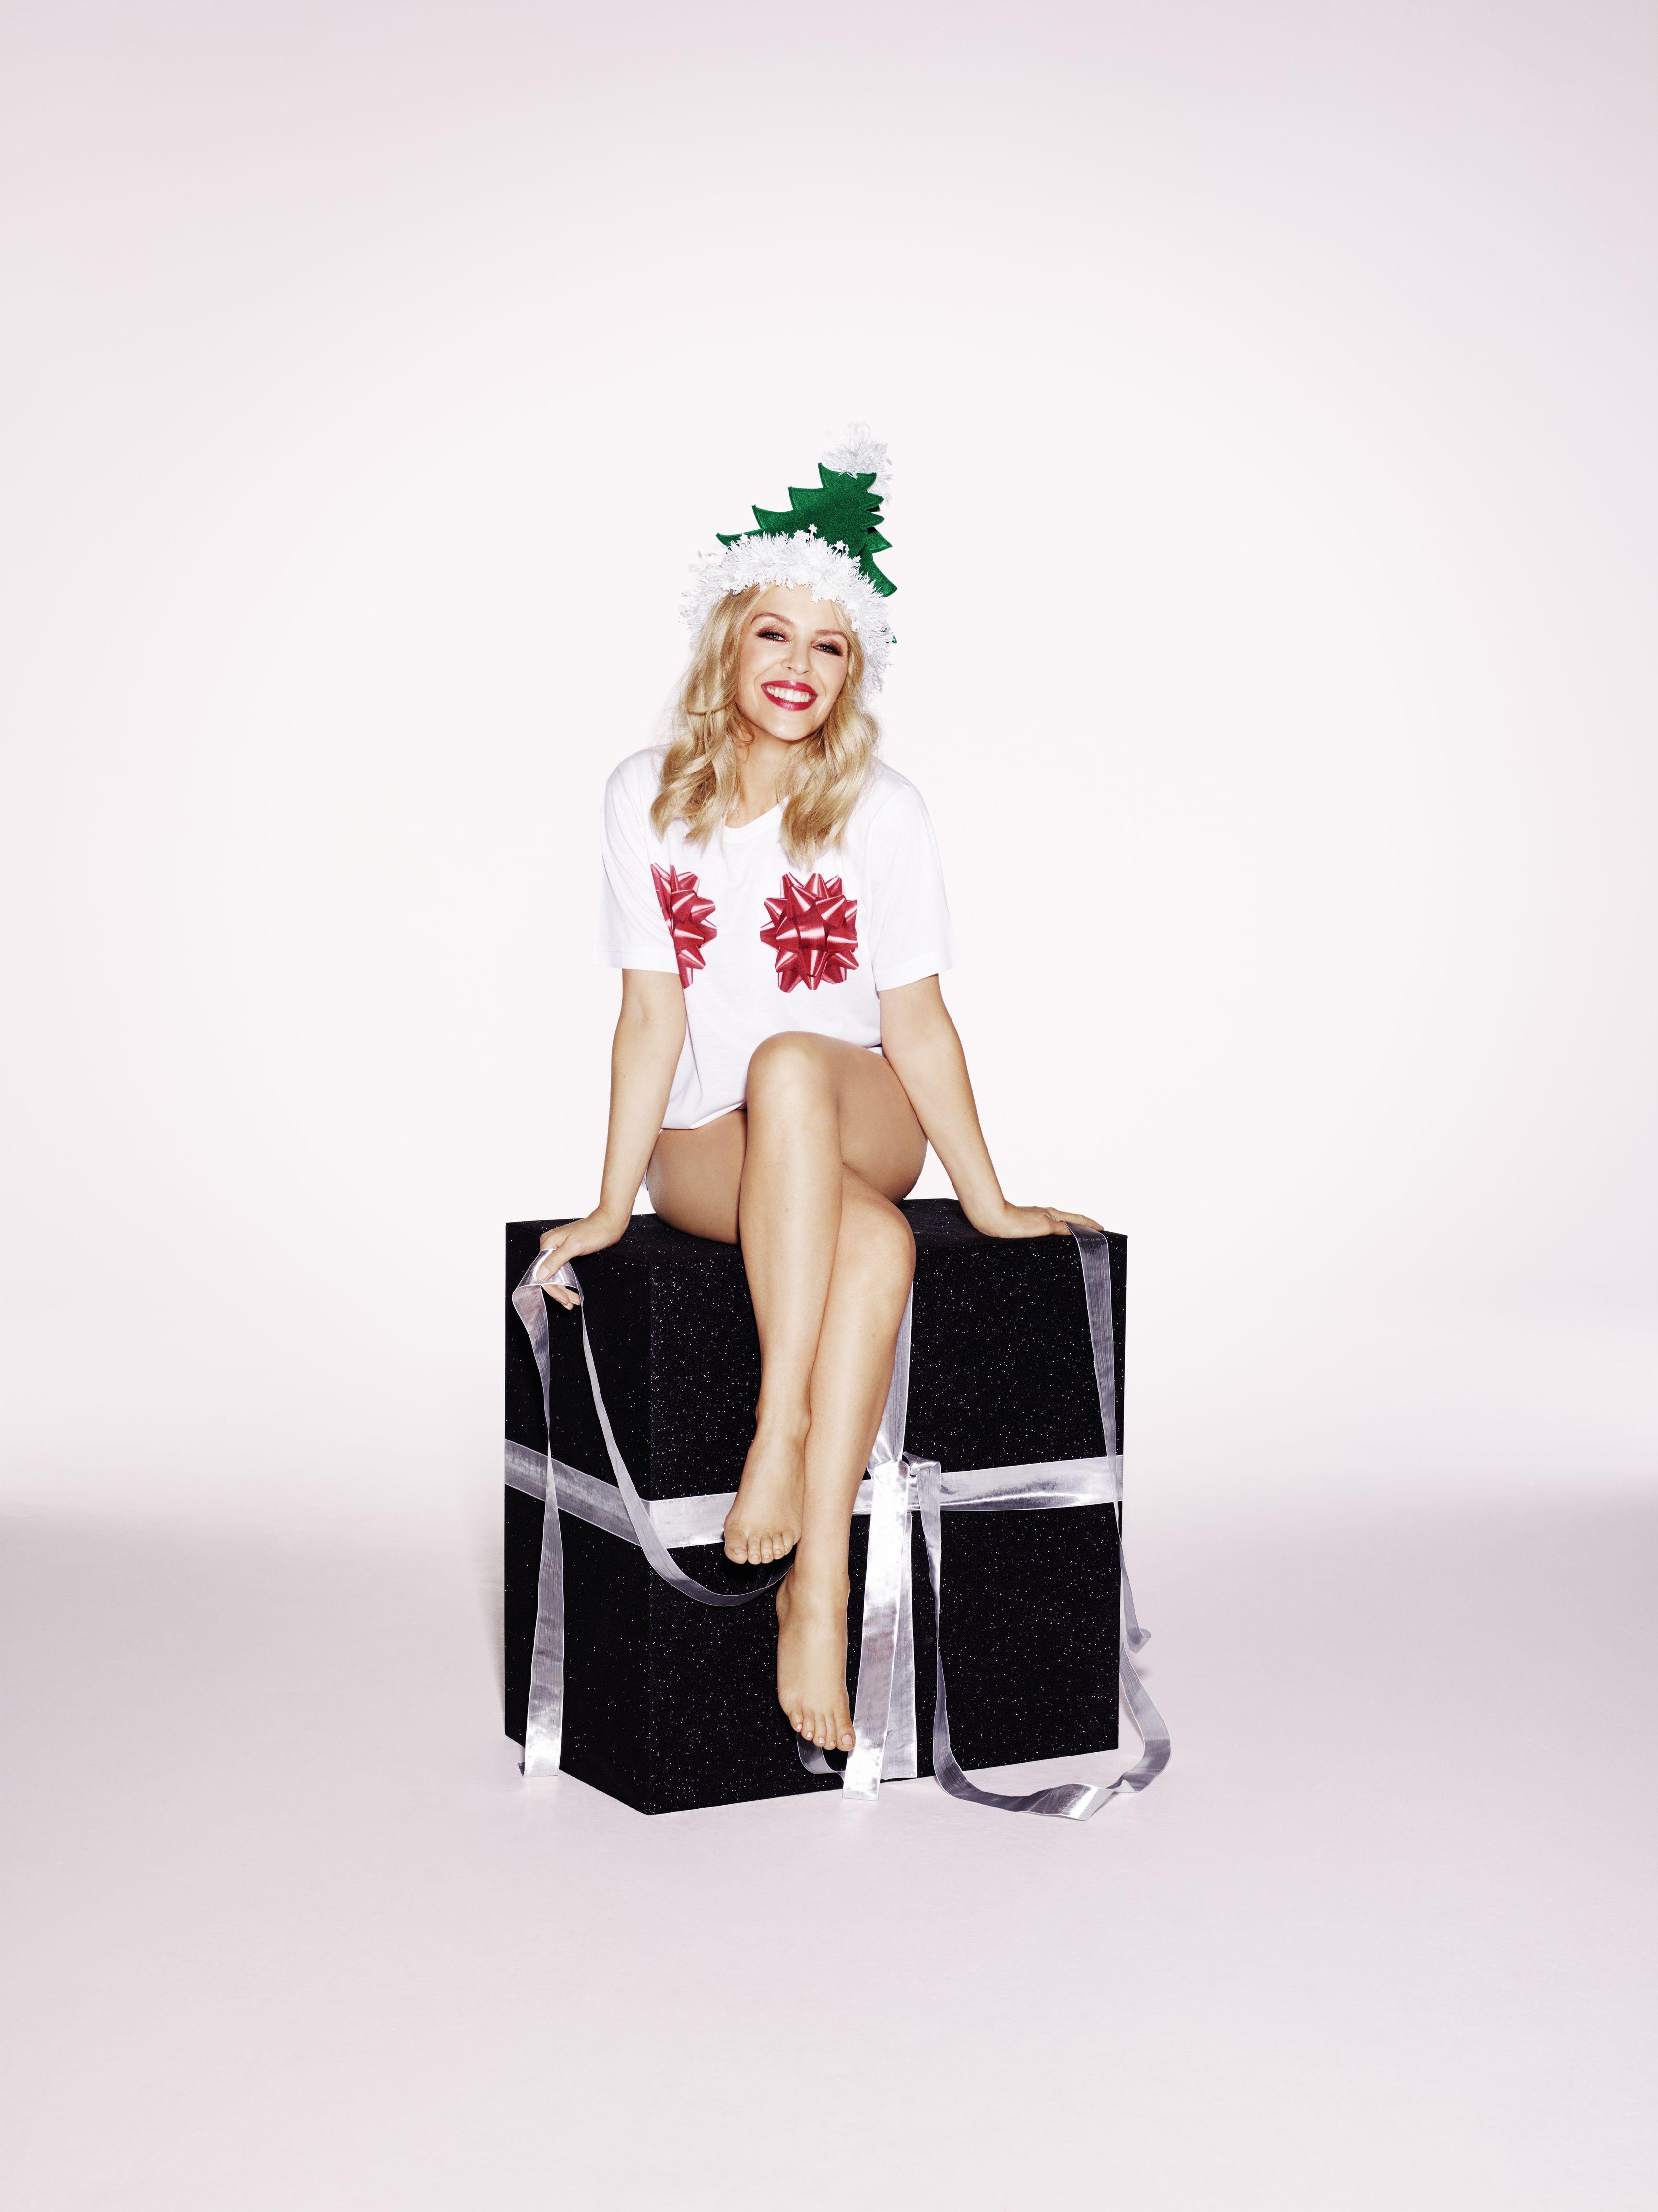 Kylie-Minogue-Sexy-3